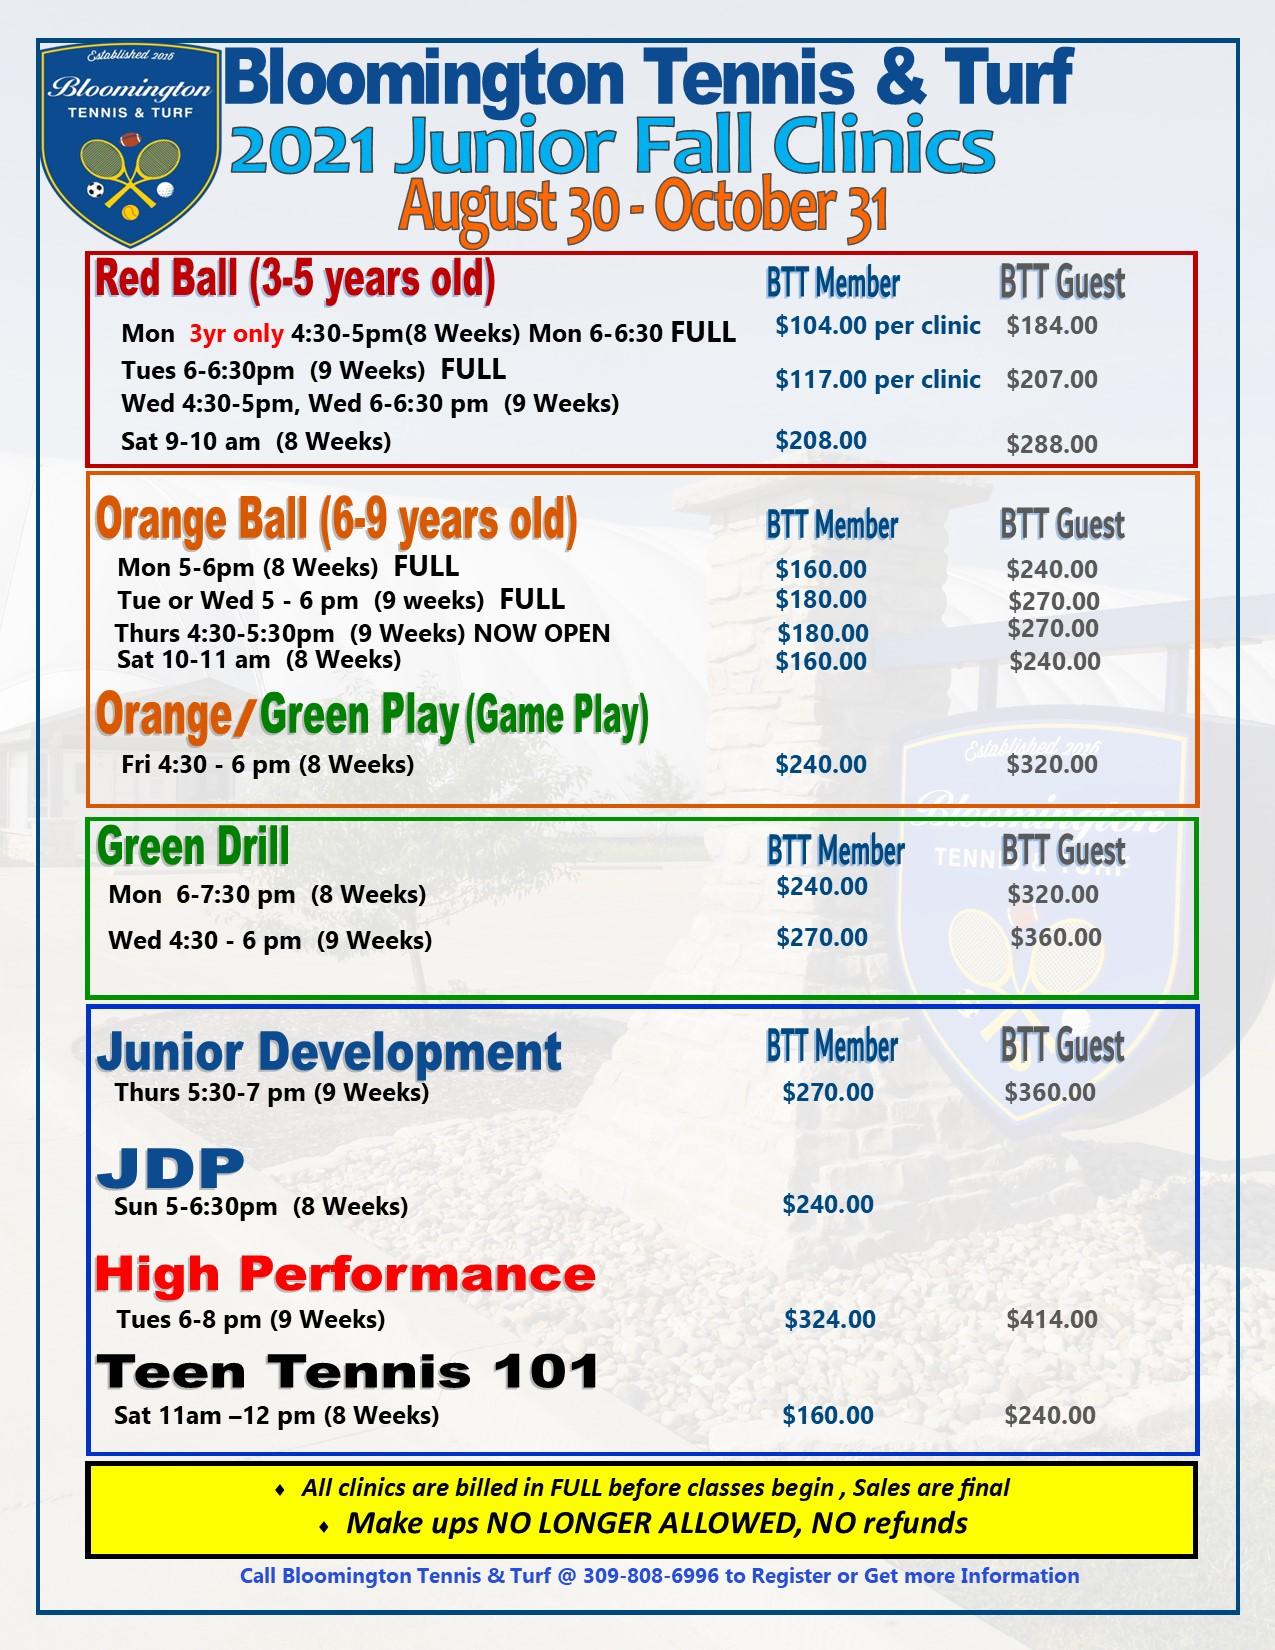 2021 Fall JR Clinic Pricing